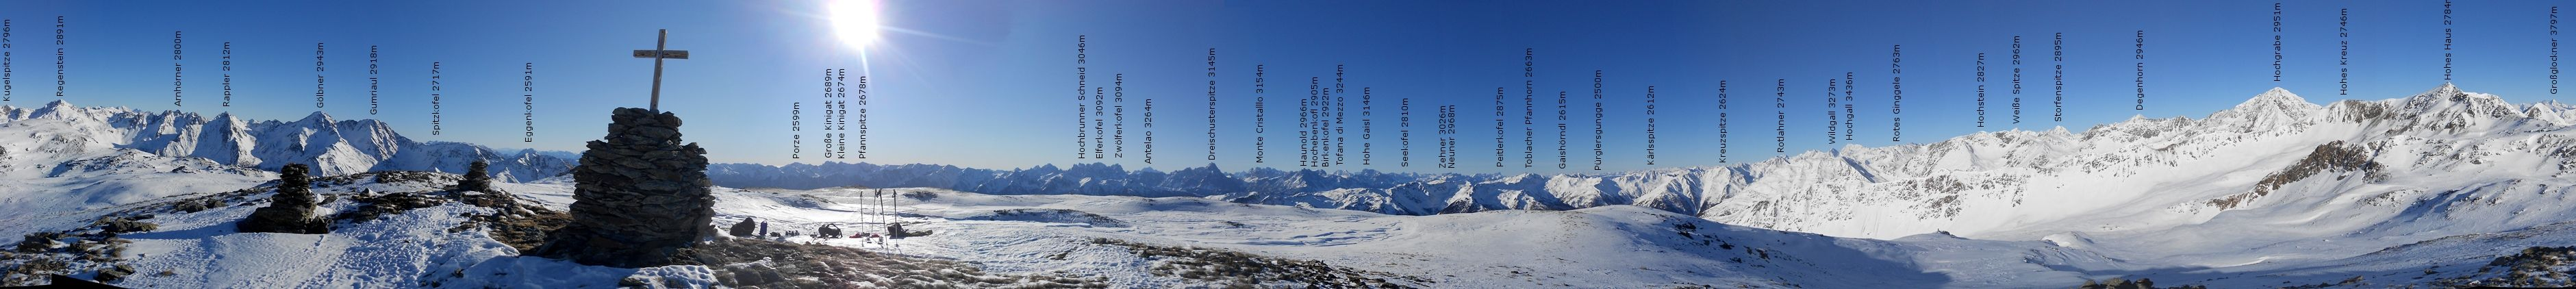 PanoramaGabesitten